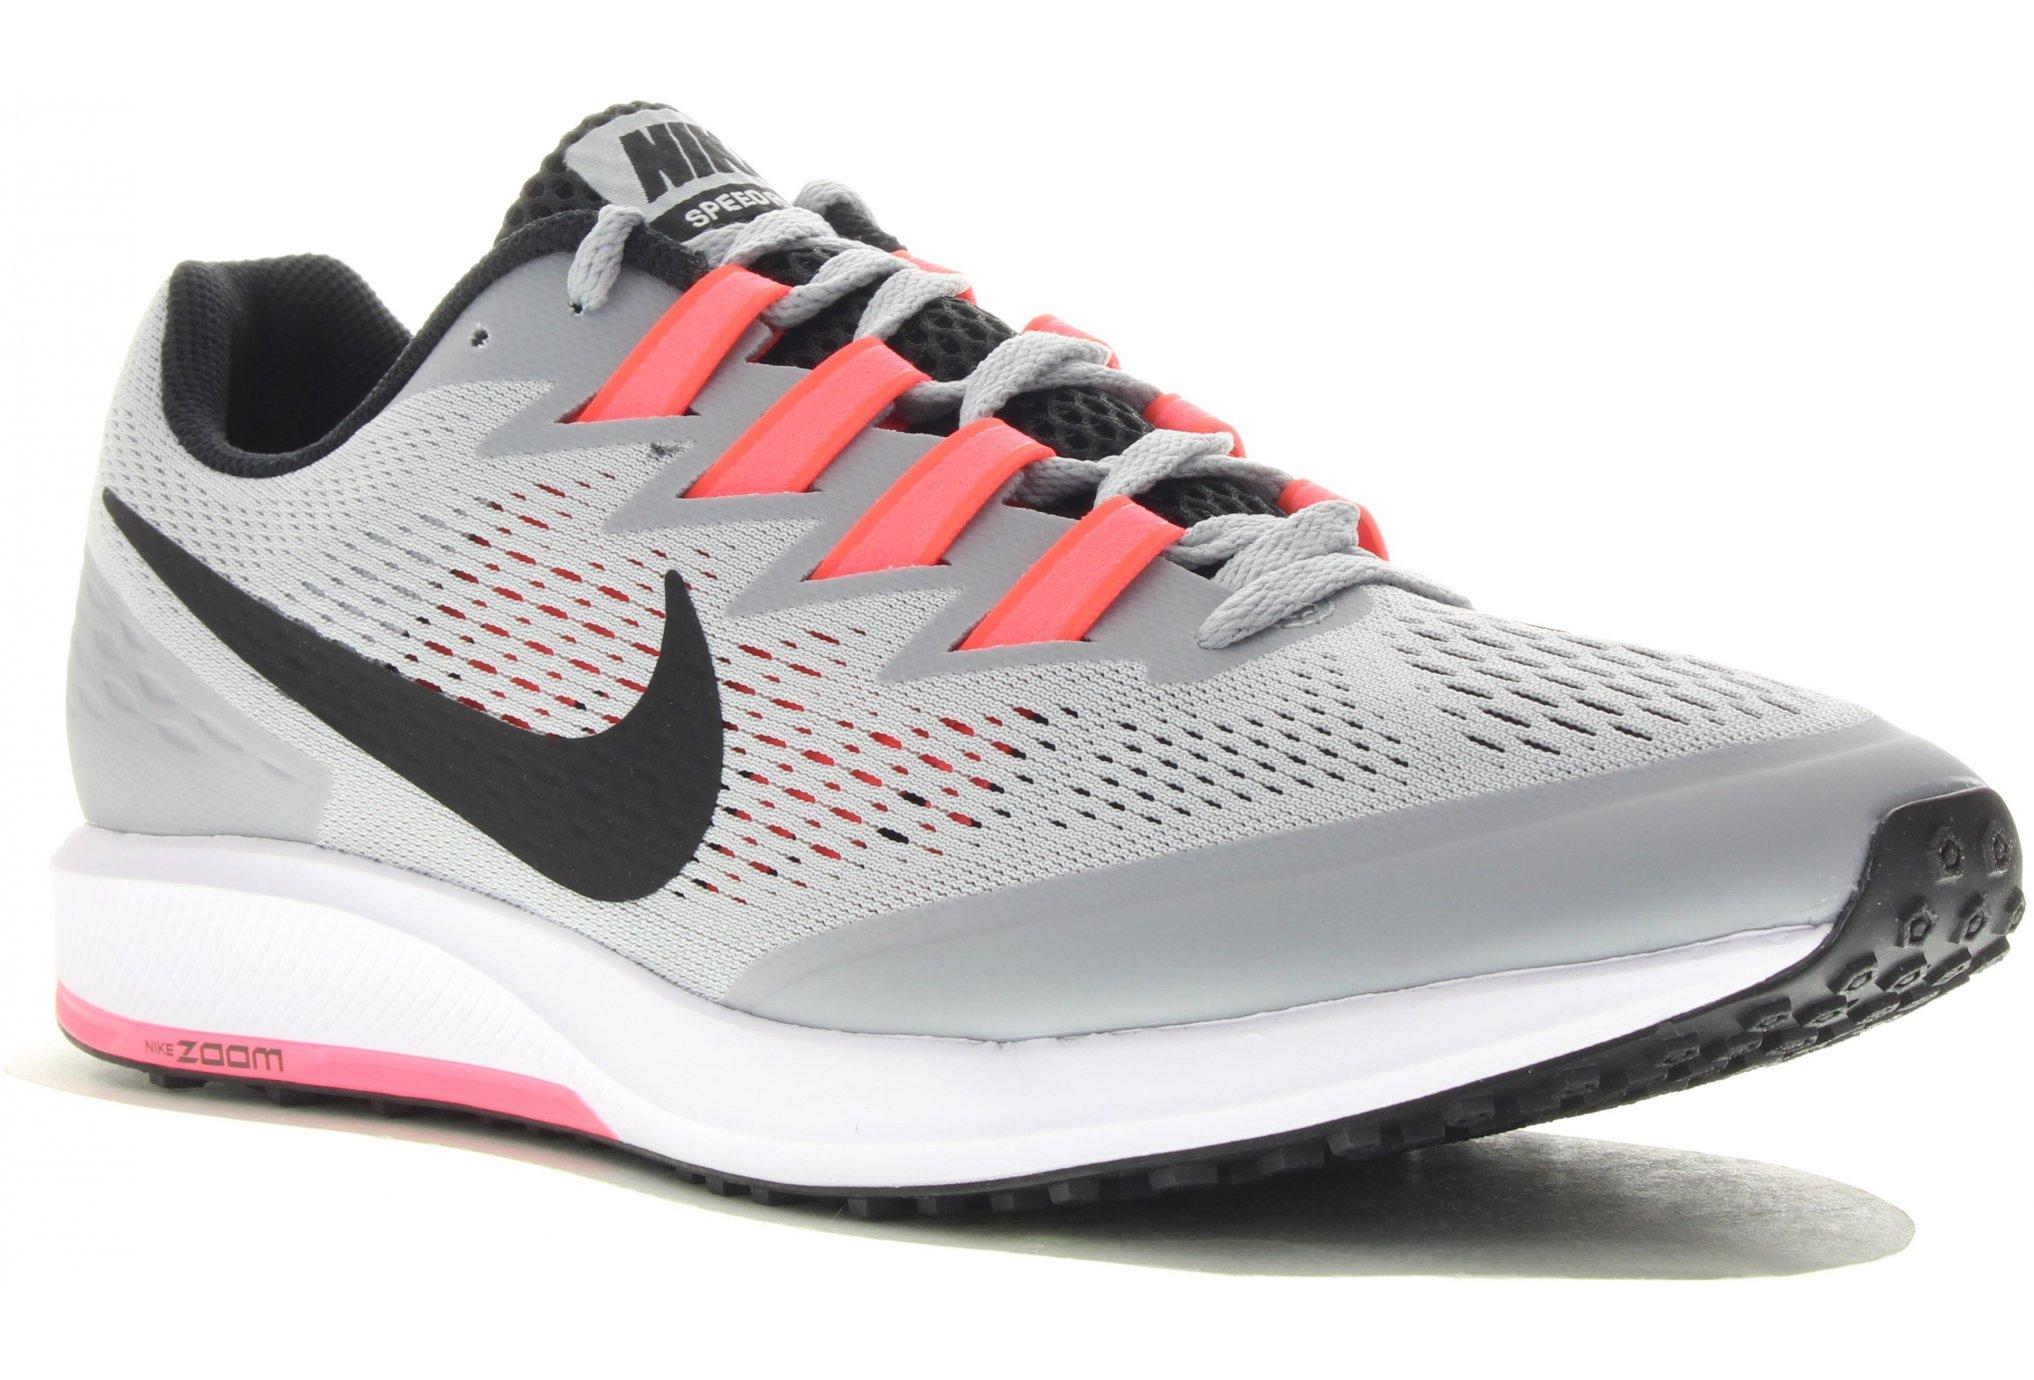 Nike Air Zoom Speed Rival 6 M Diététique Chaussures homme